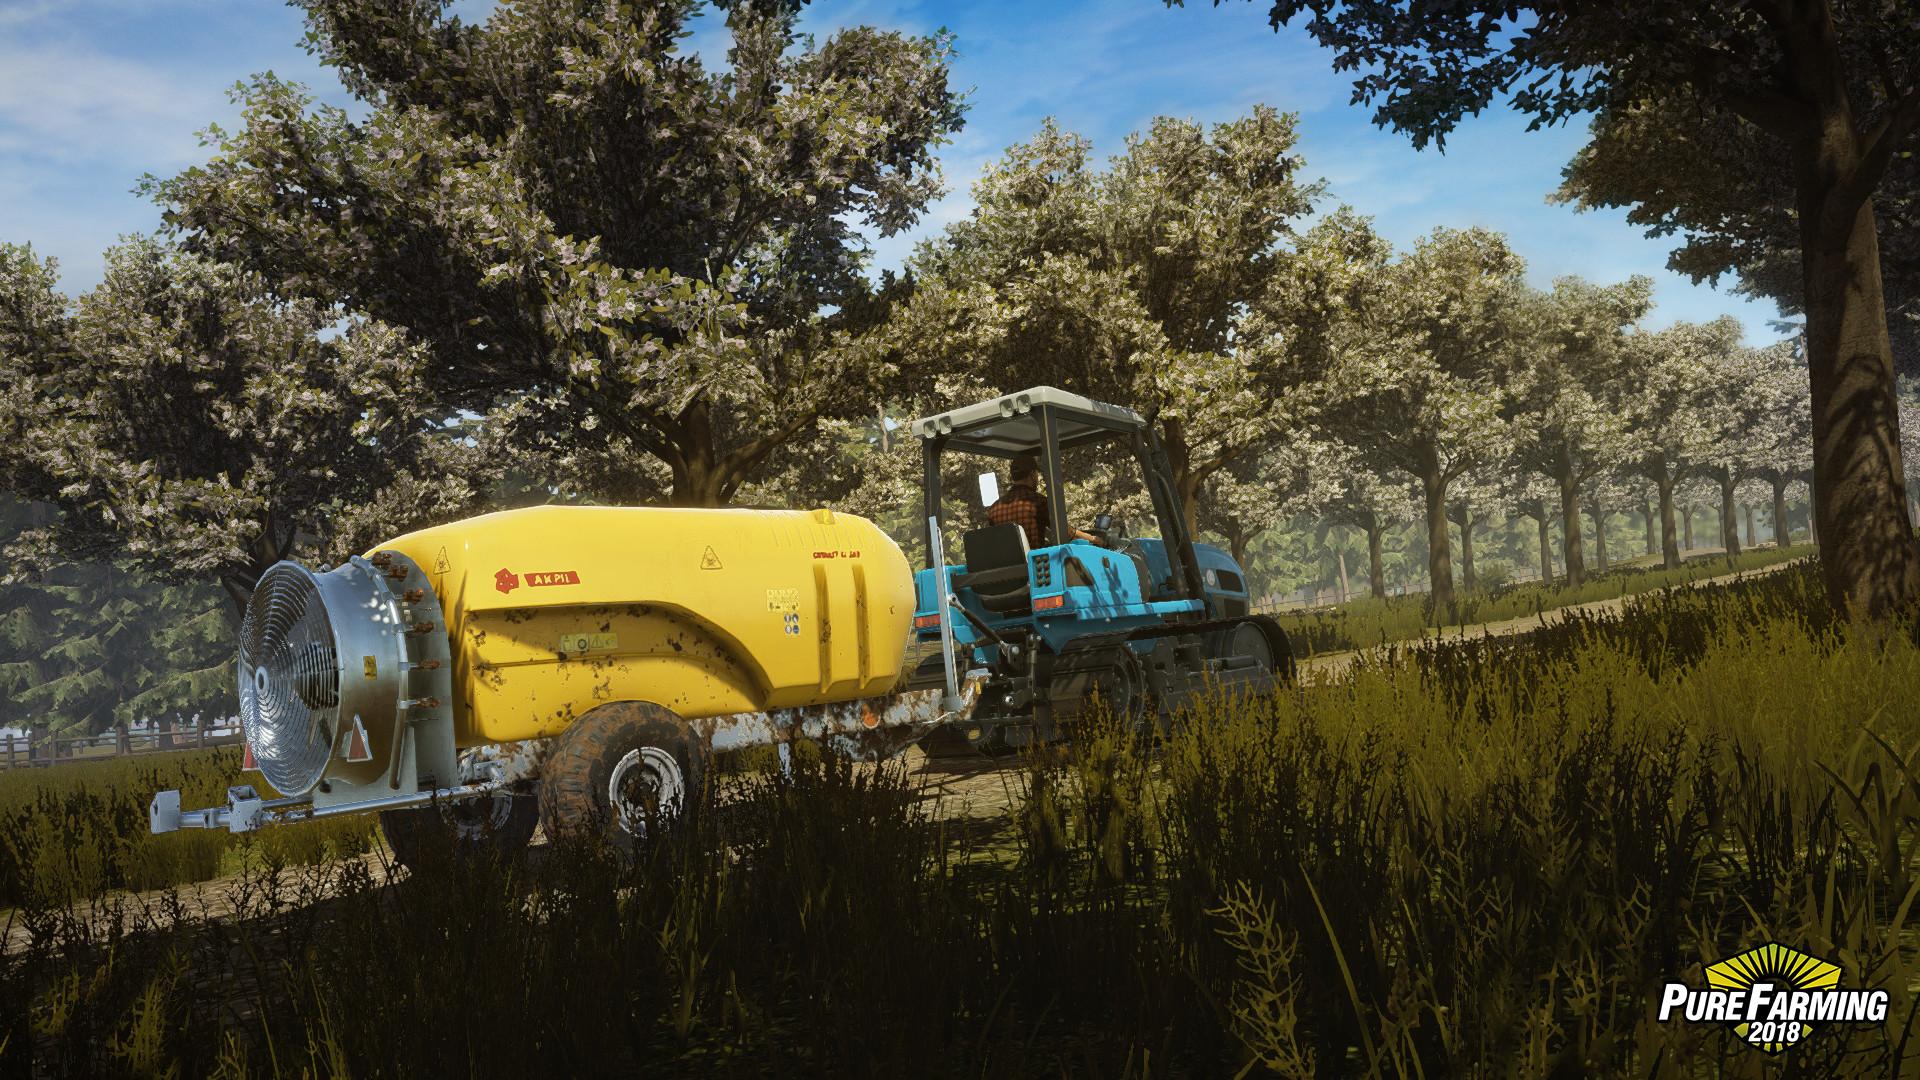 Pure Farming 2018 (Steam key) @ RU 2019